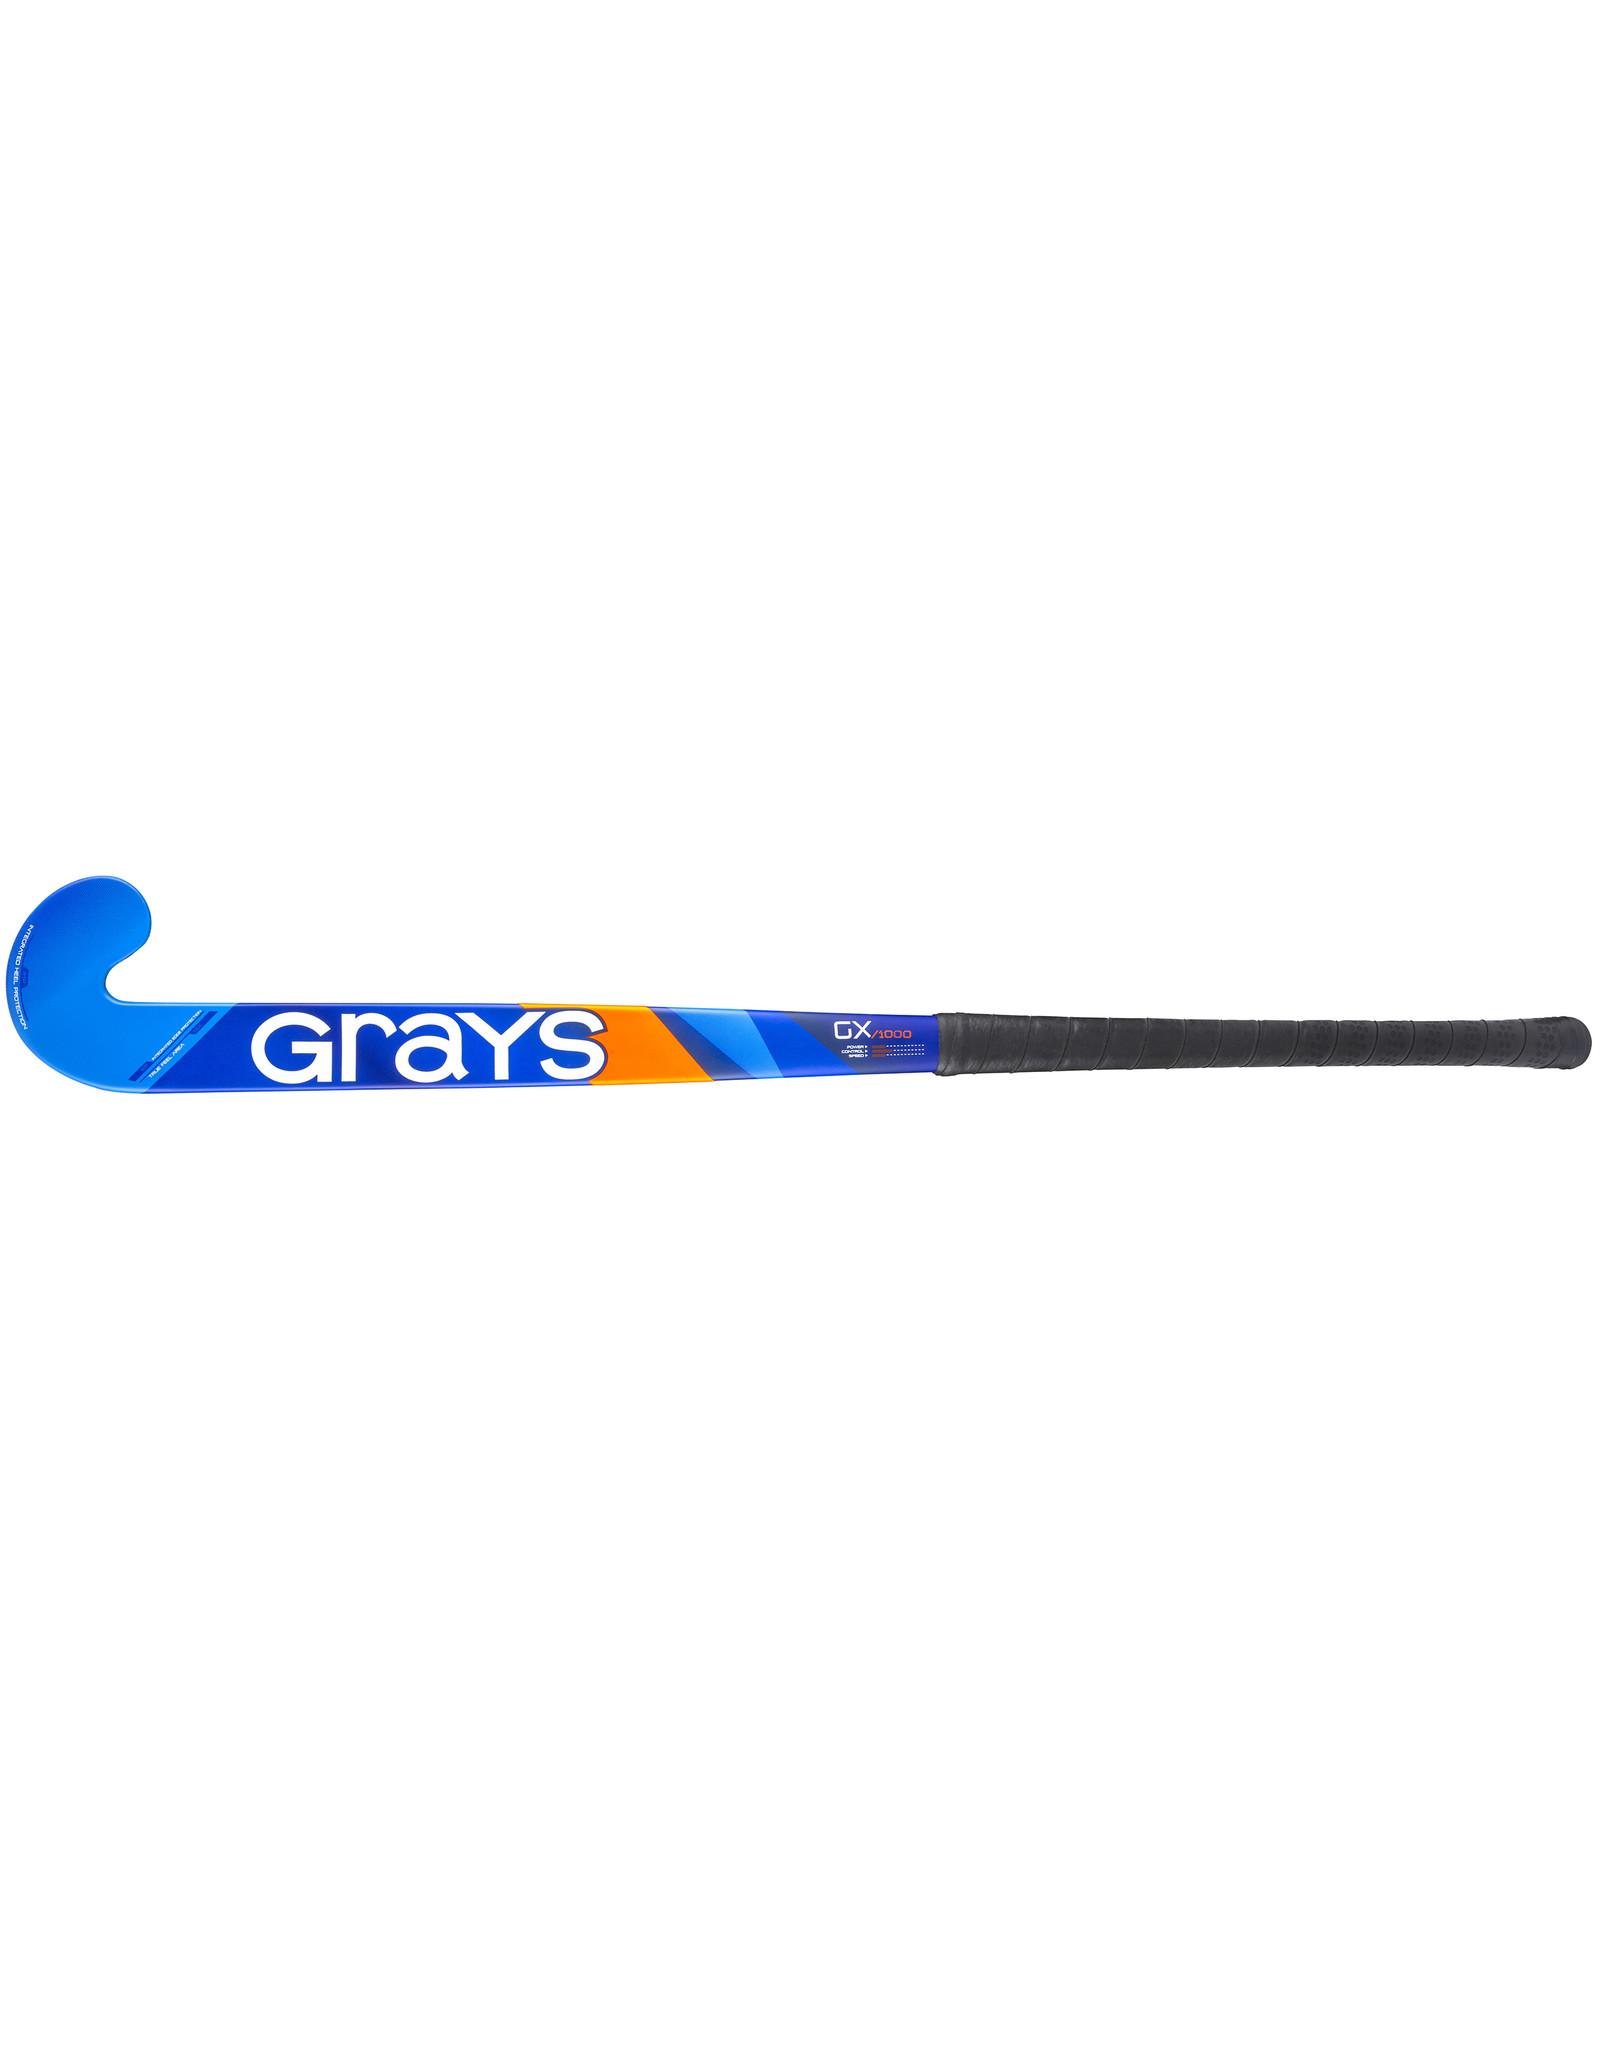 Grays STK GX1000 UB MC BLAUW